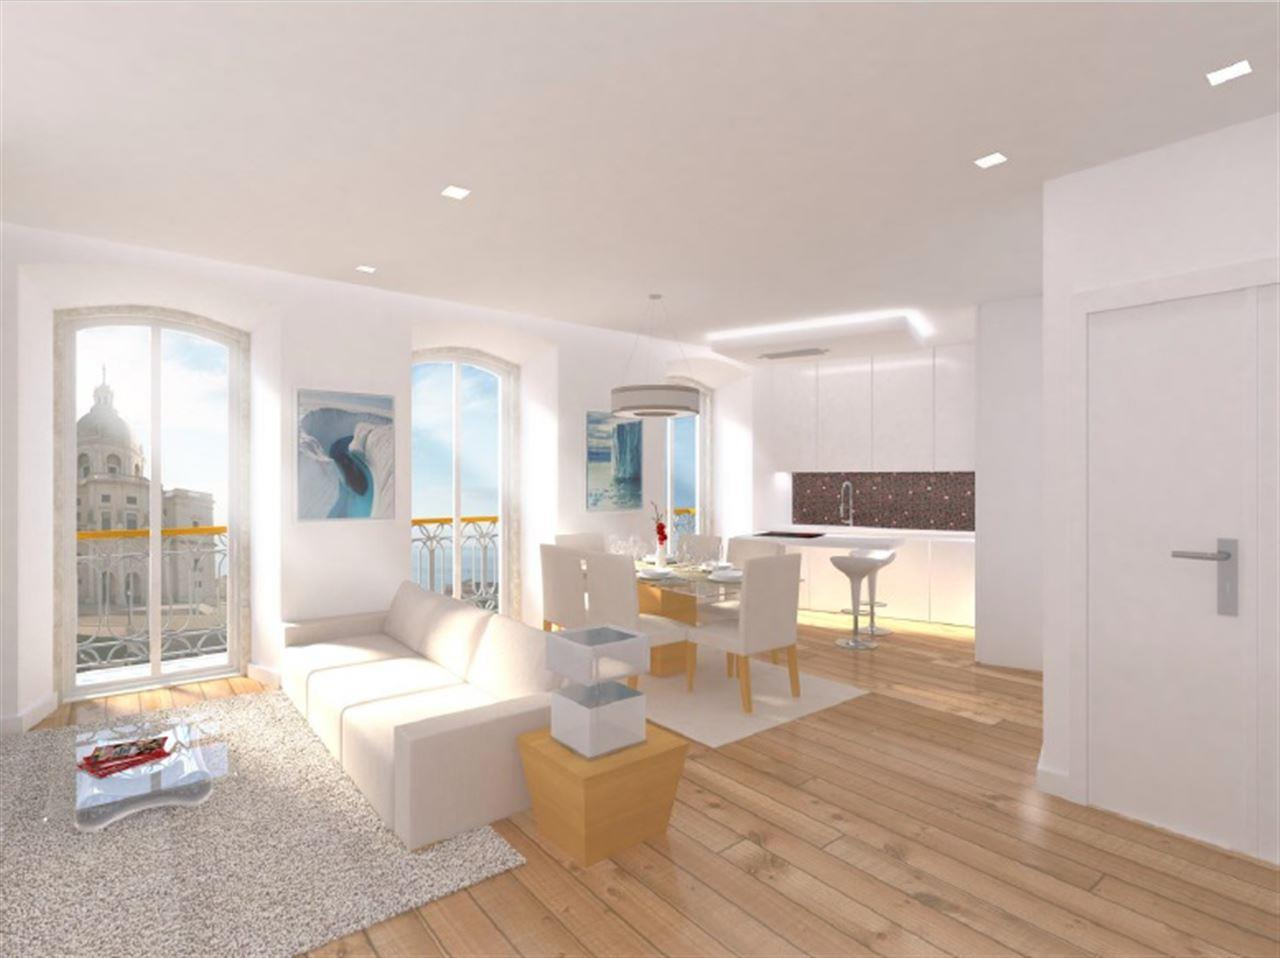 Apartment for Sale at Flat, 3 bedrooms, for Sale Lisboa, Lisboa, 1100-471 Portugal